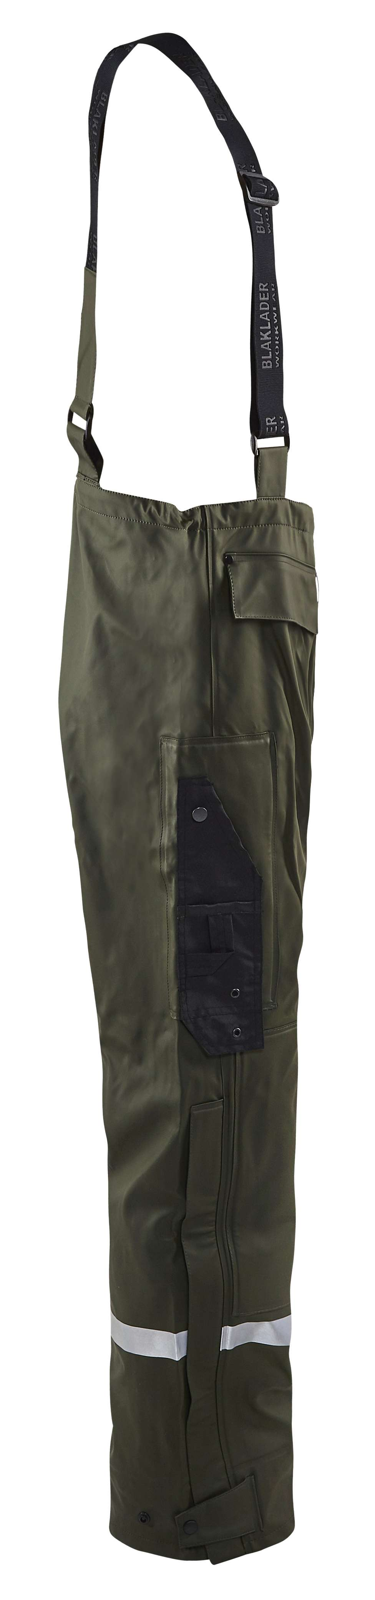 Blaklader Regenbroeken 13022003 High Vis army groen(4600)